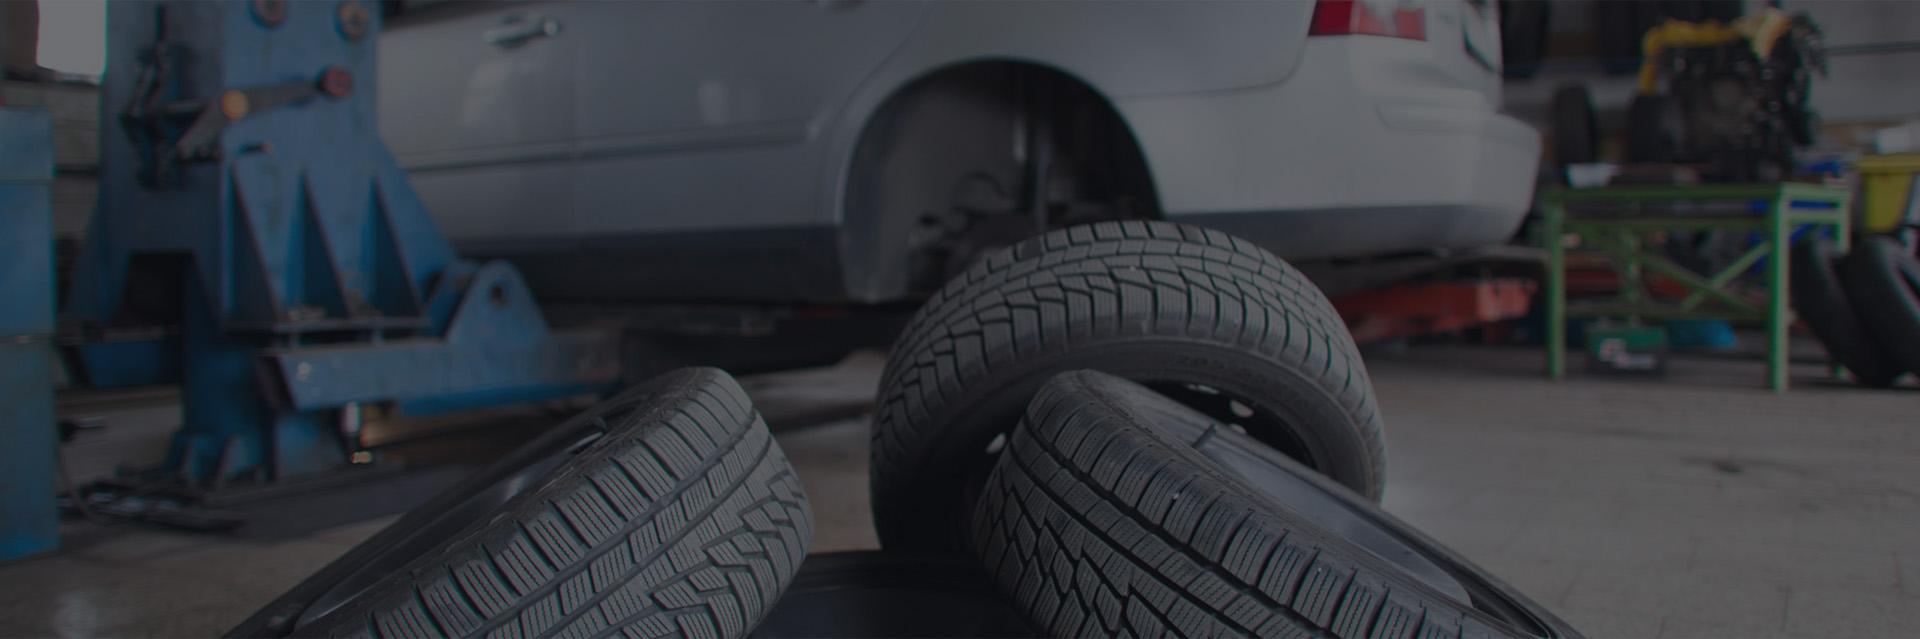 Home - image header-tc-cheapest-tyres-victoria on https://aatyresandauto.com.au